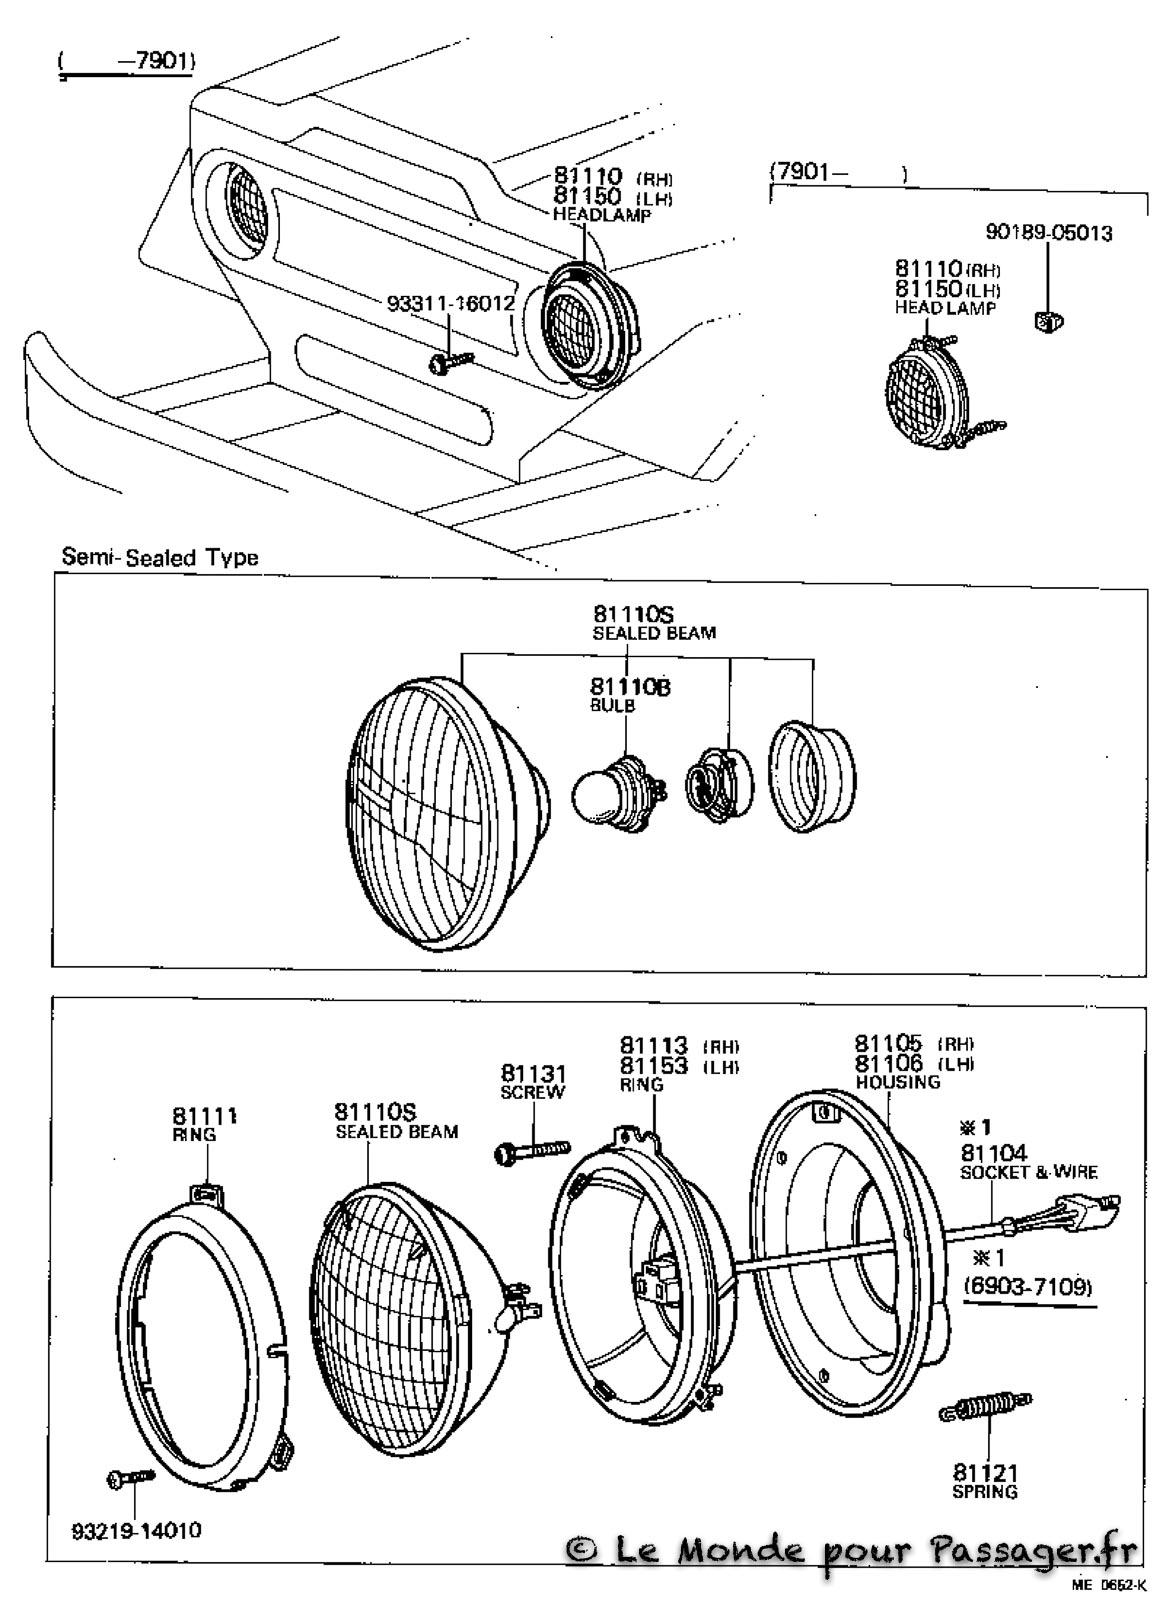 Fj55-Eclatés-Techniques071